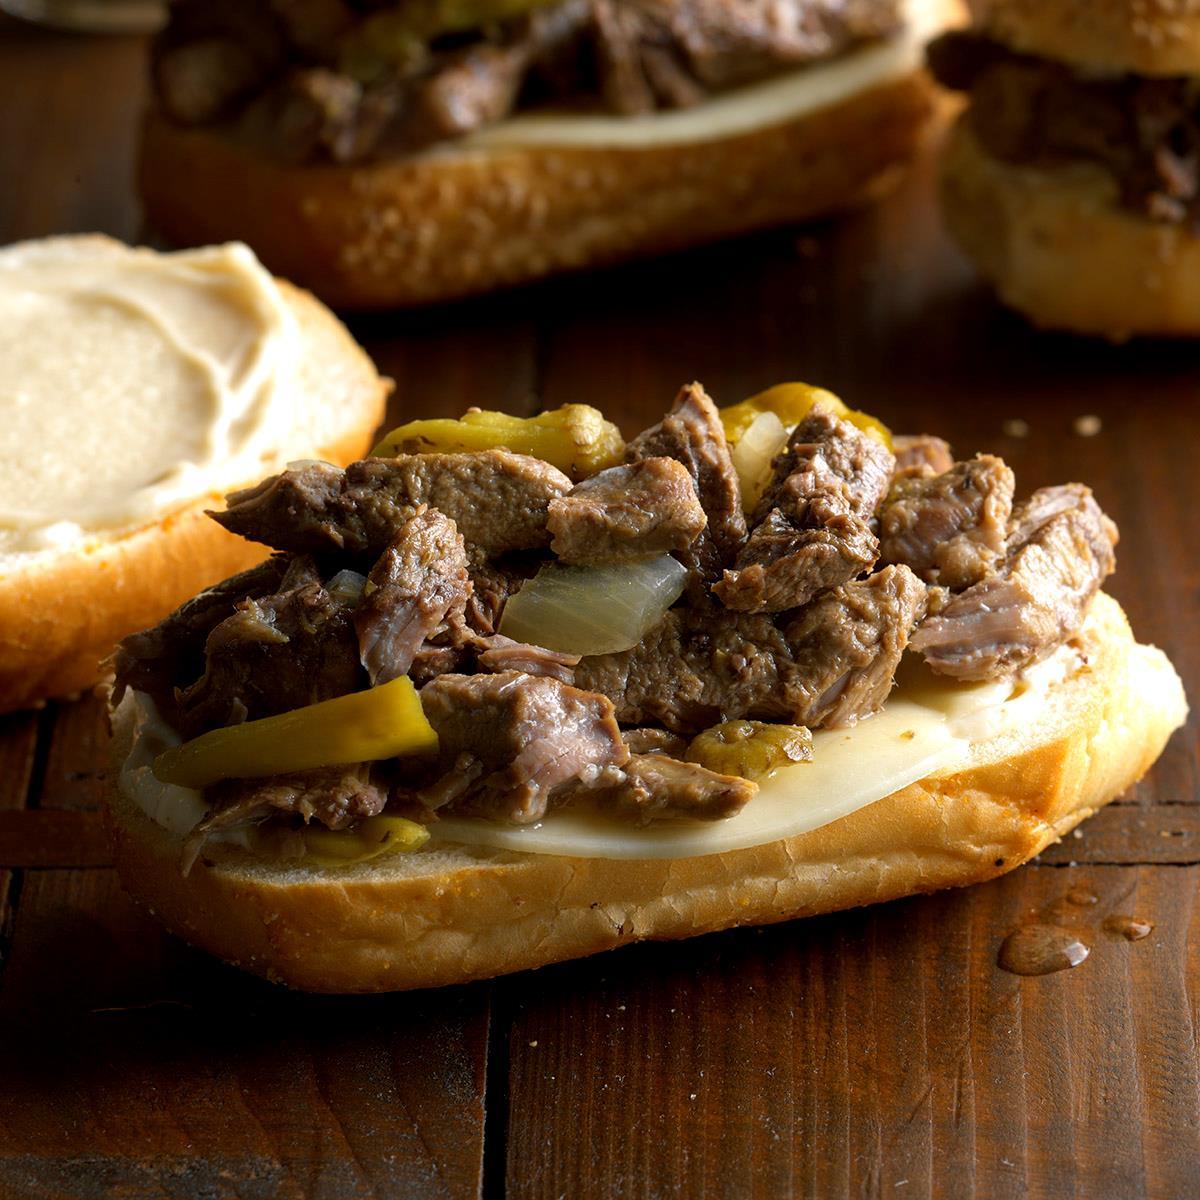 Italian-Sirloin-Beef-Sandwiches_EXPS_SCMBZ17_30688_B01_11_5b.jpg